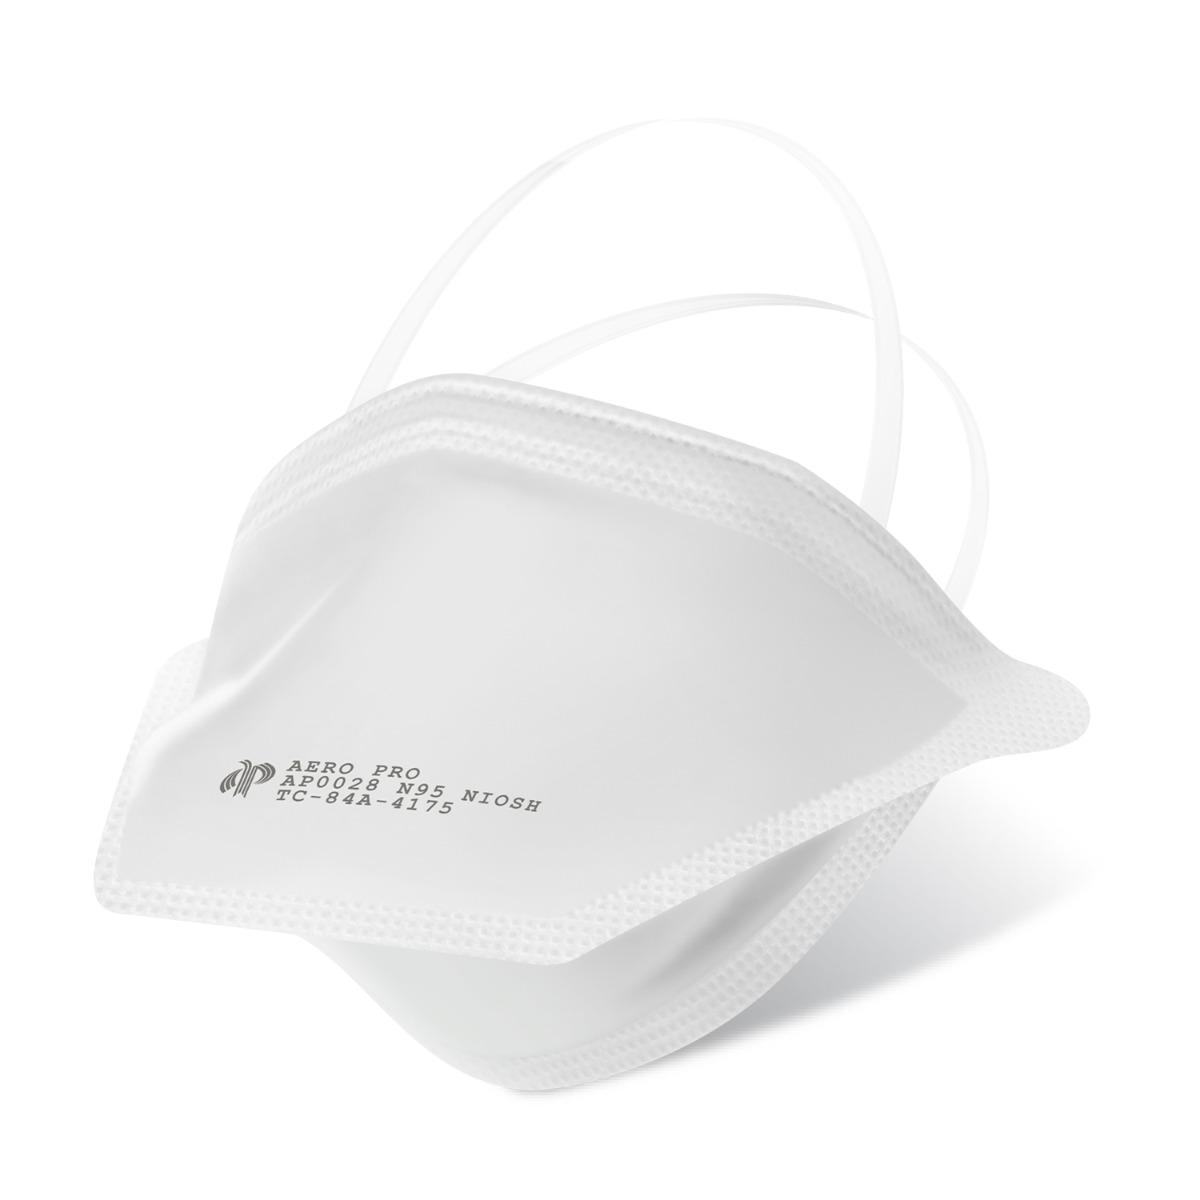 90-Pack N95 Respirator (NIOSH), FDA Cleared Surgical Respirator Mask, Medical Grade Disposable Particulate Filtering Respirator (90 Count)